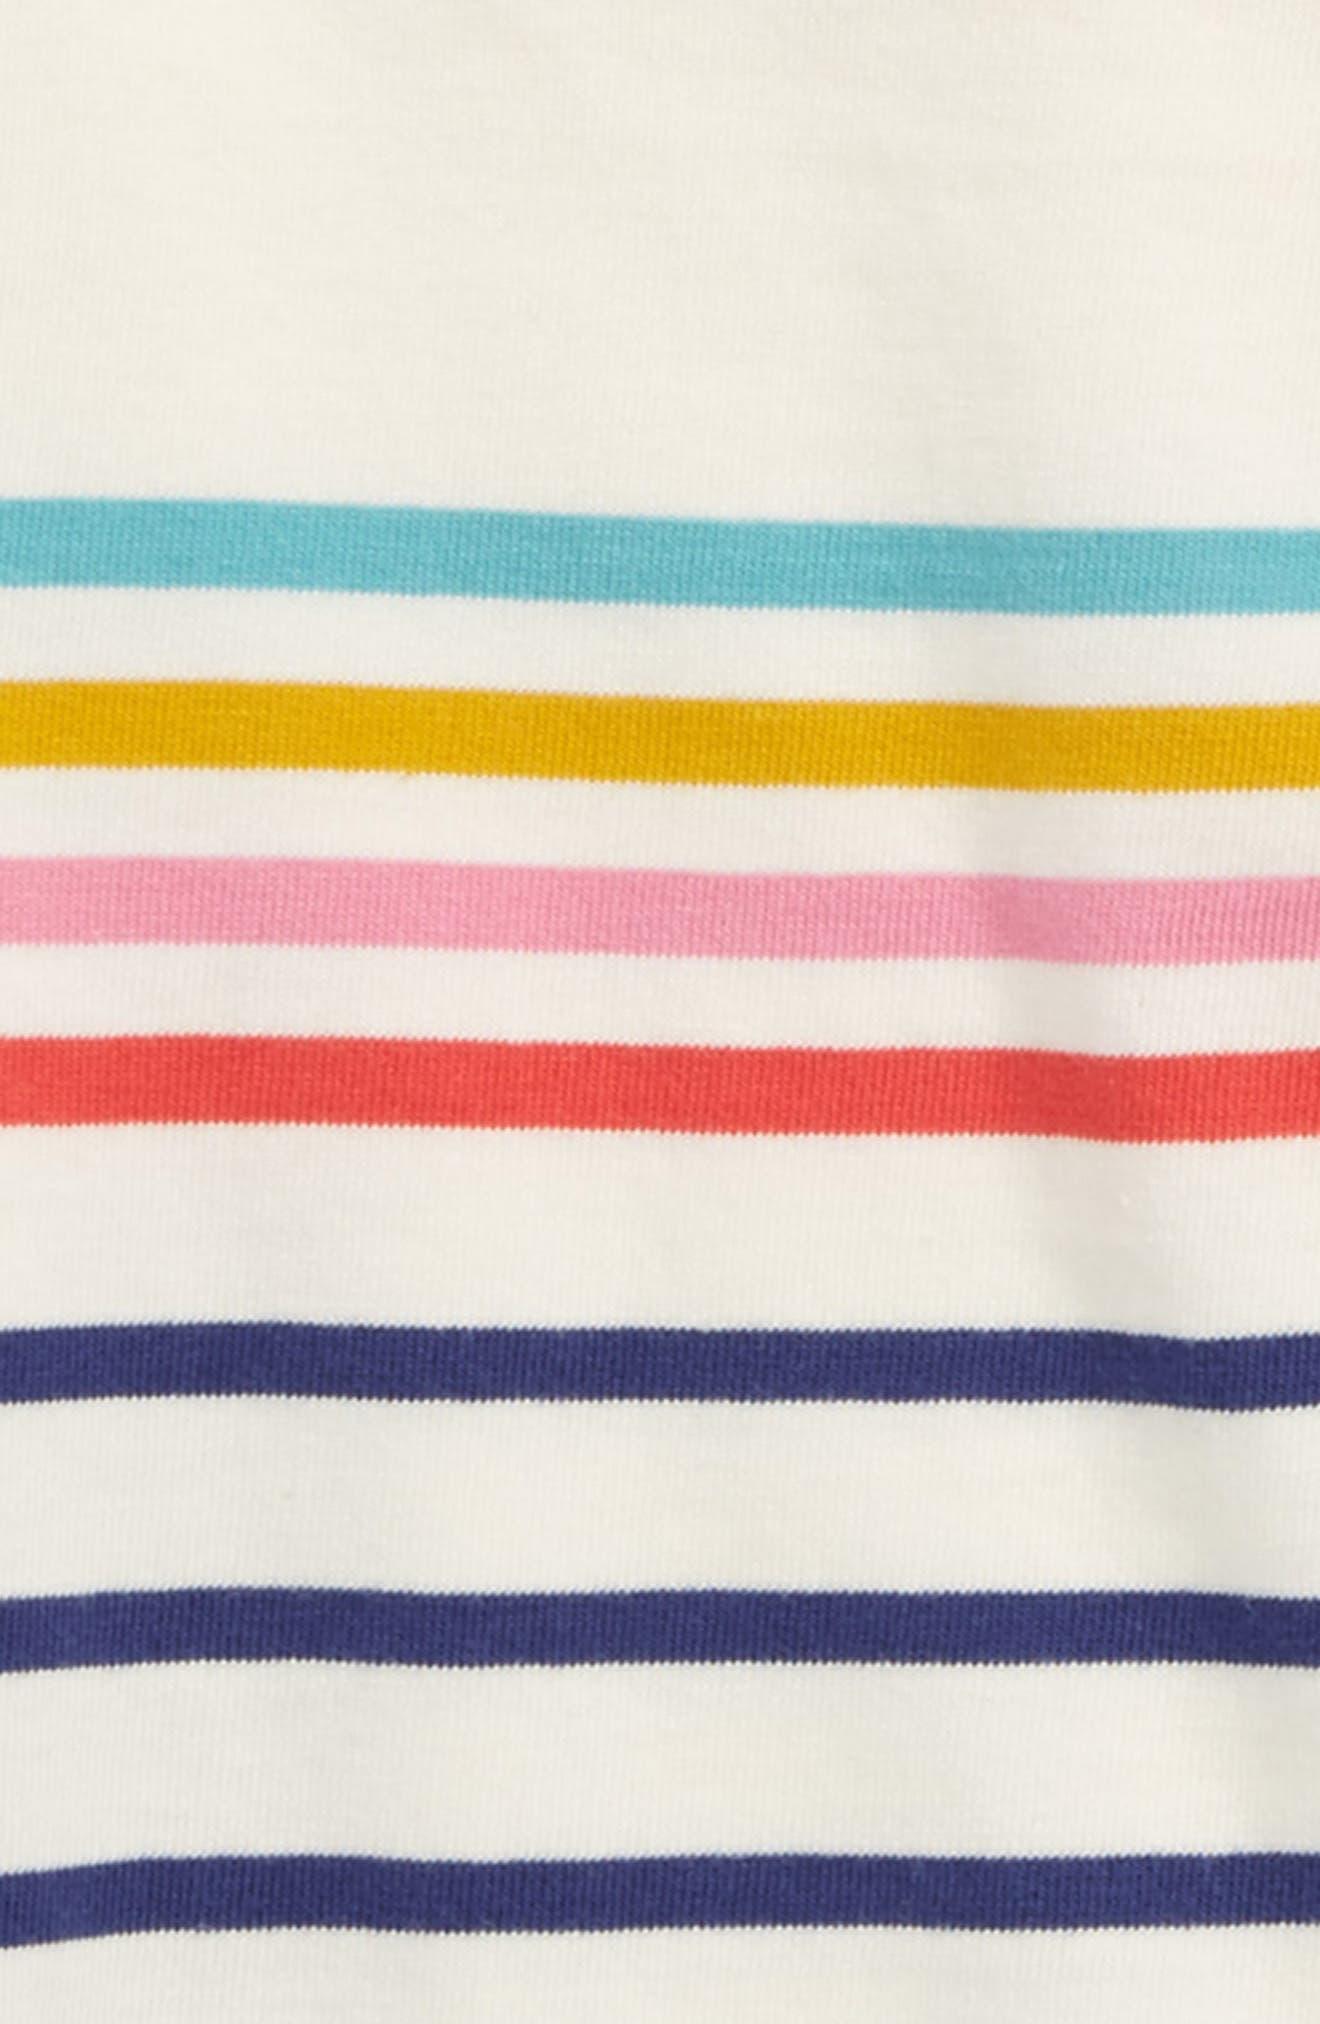 Colourfully Stripy Tee,                             Alternate thumbnail 2, color,                             906